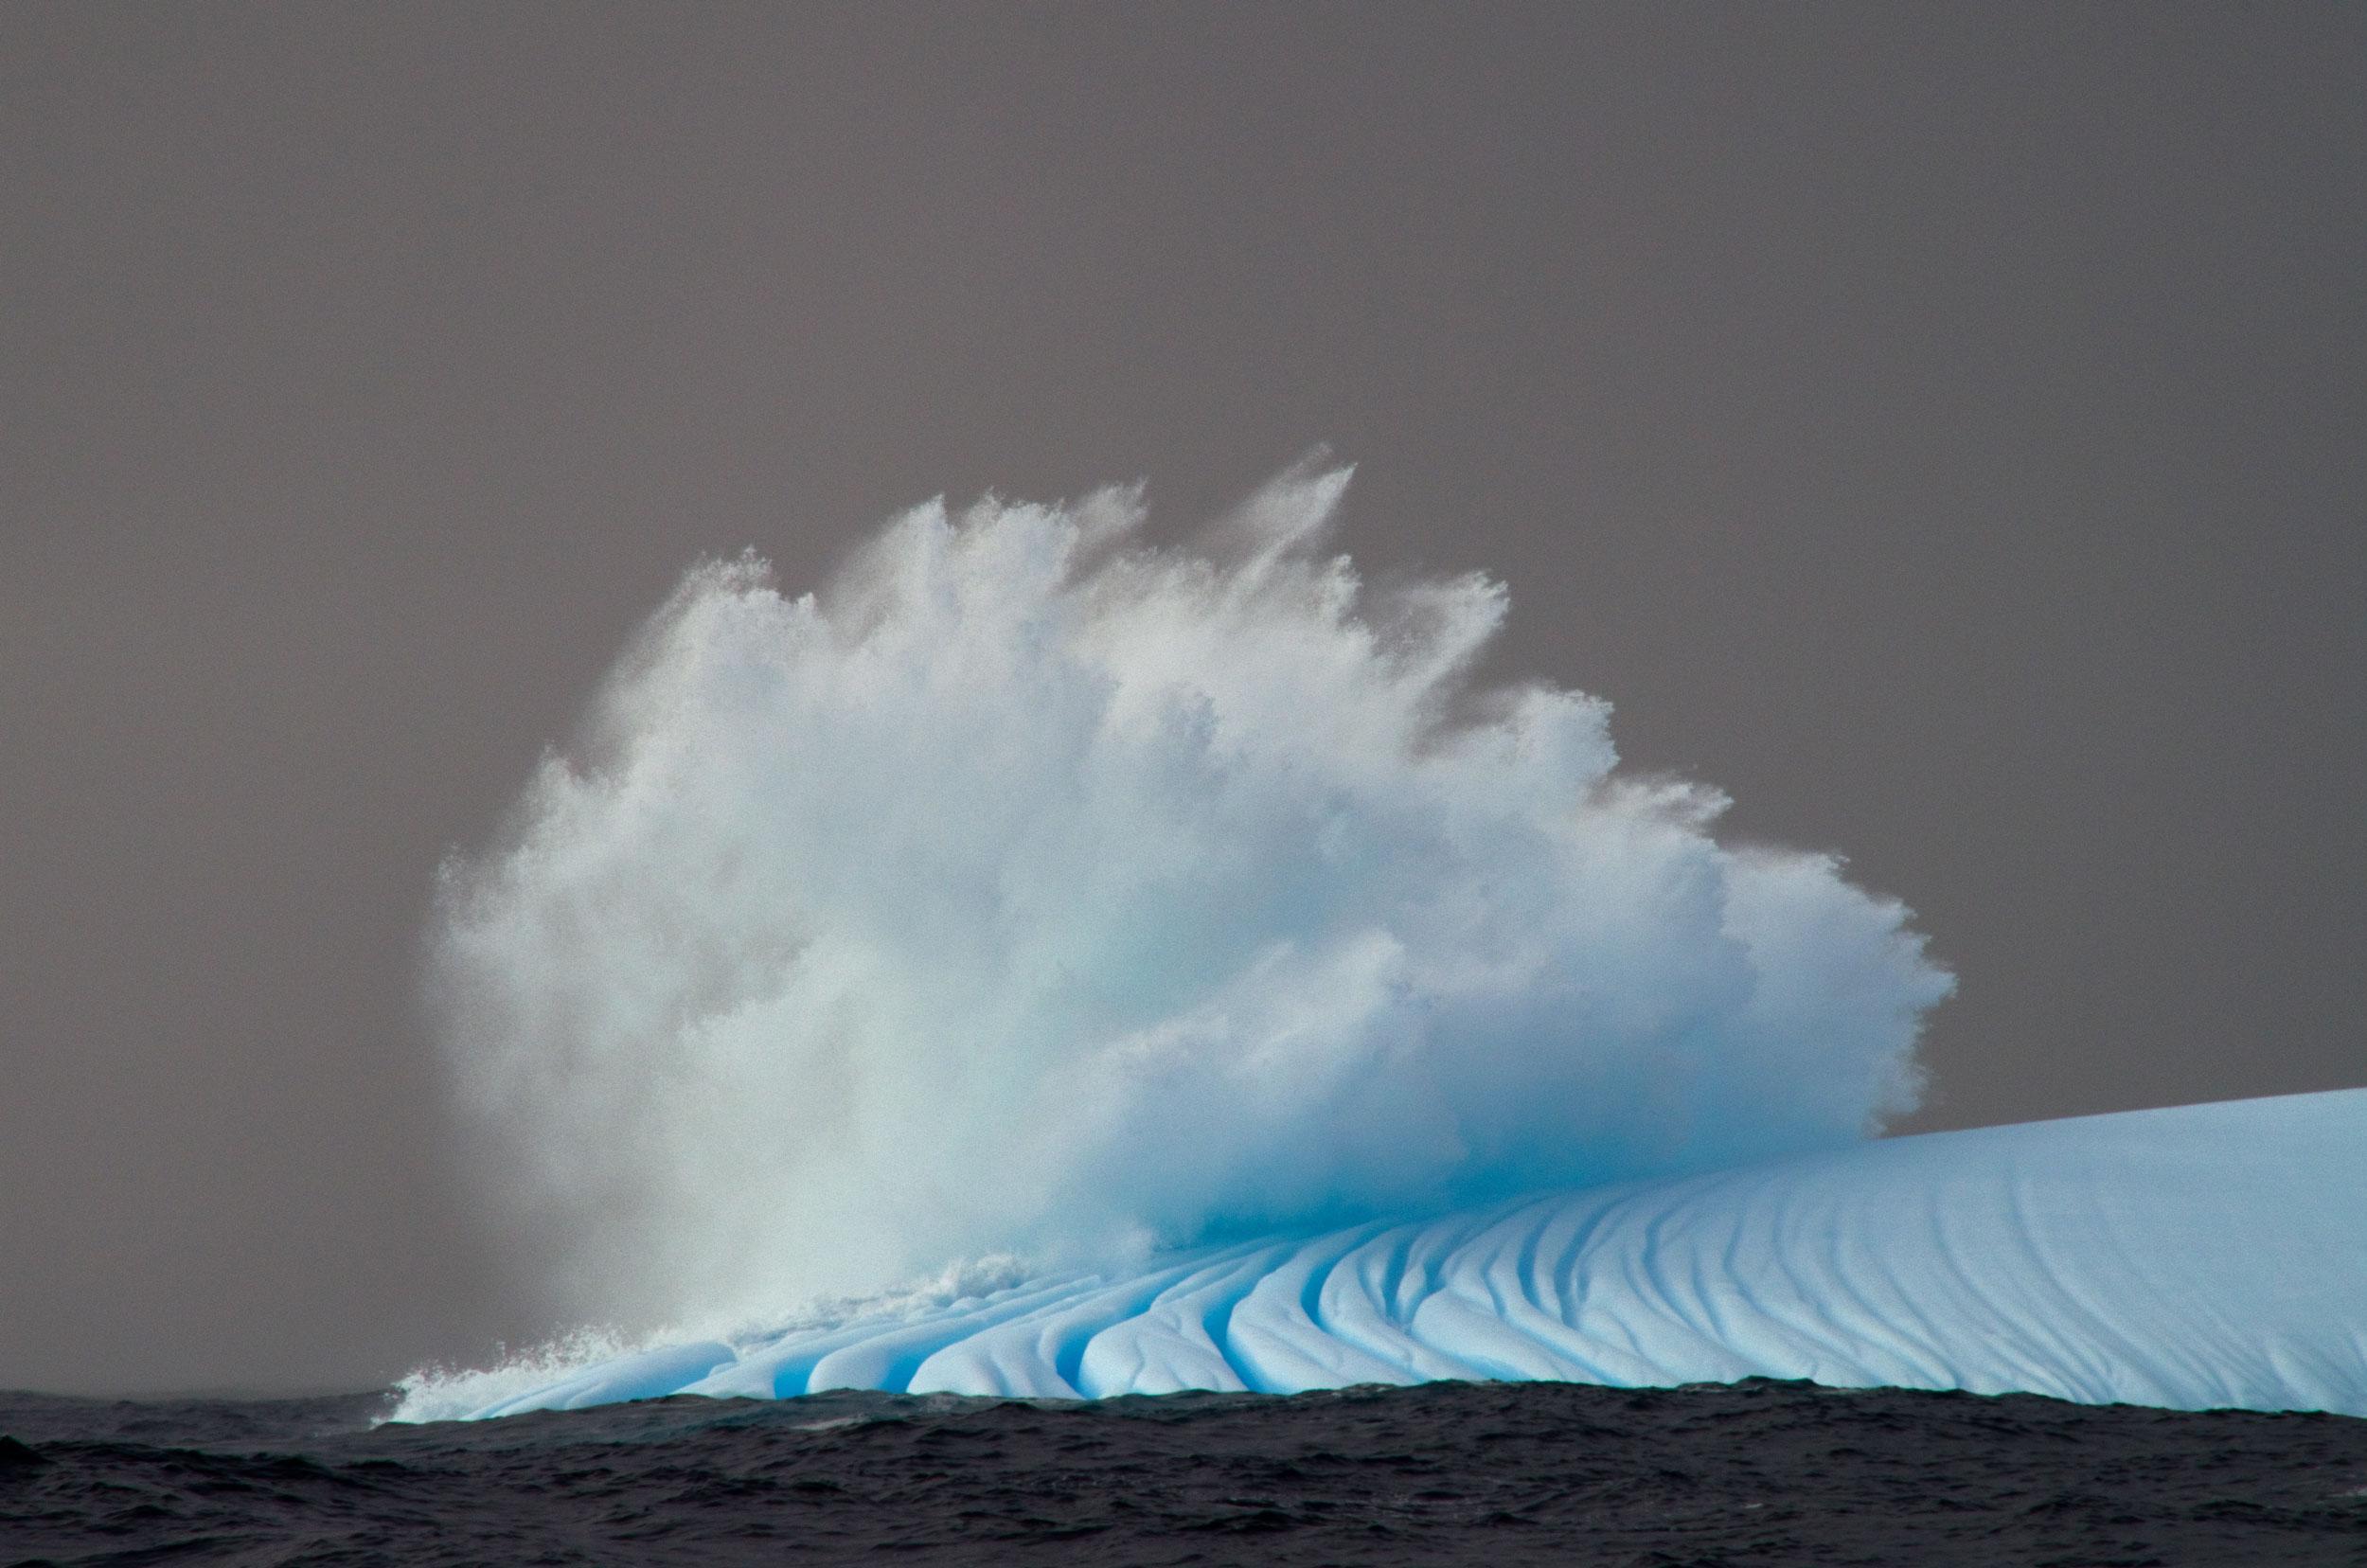 Iceburg and sea-spray. Photo: Nico Edwards